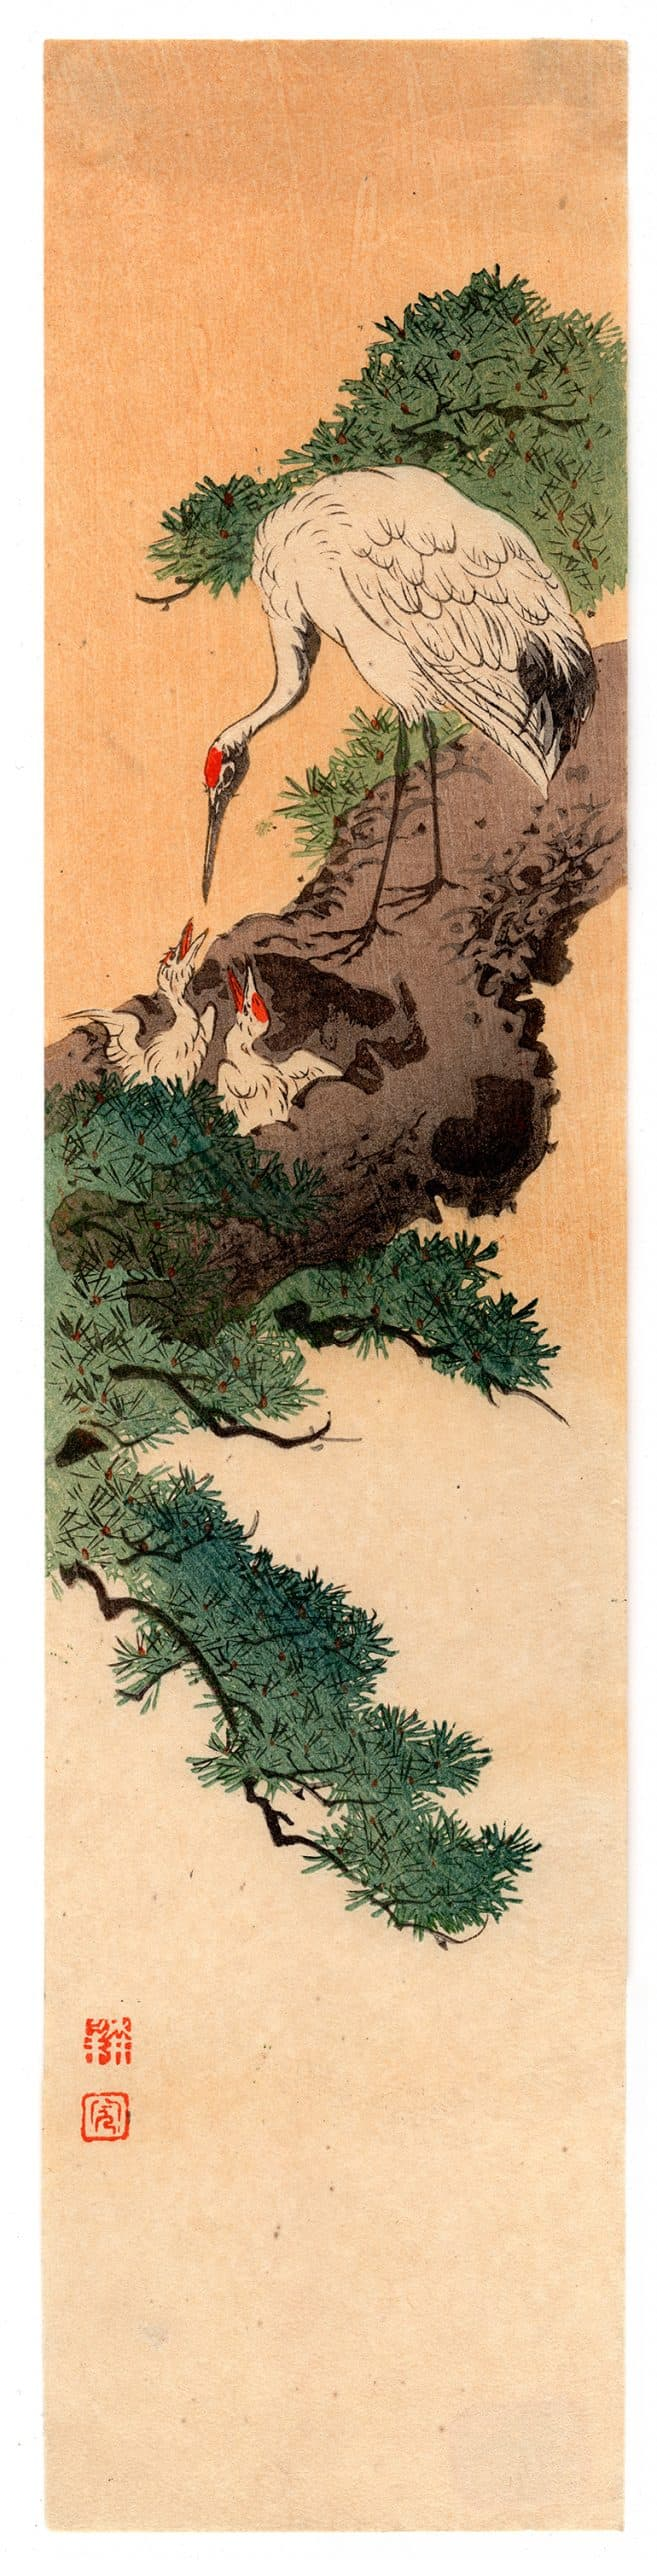 Shoda Koho - Heron and Chicks